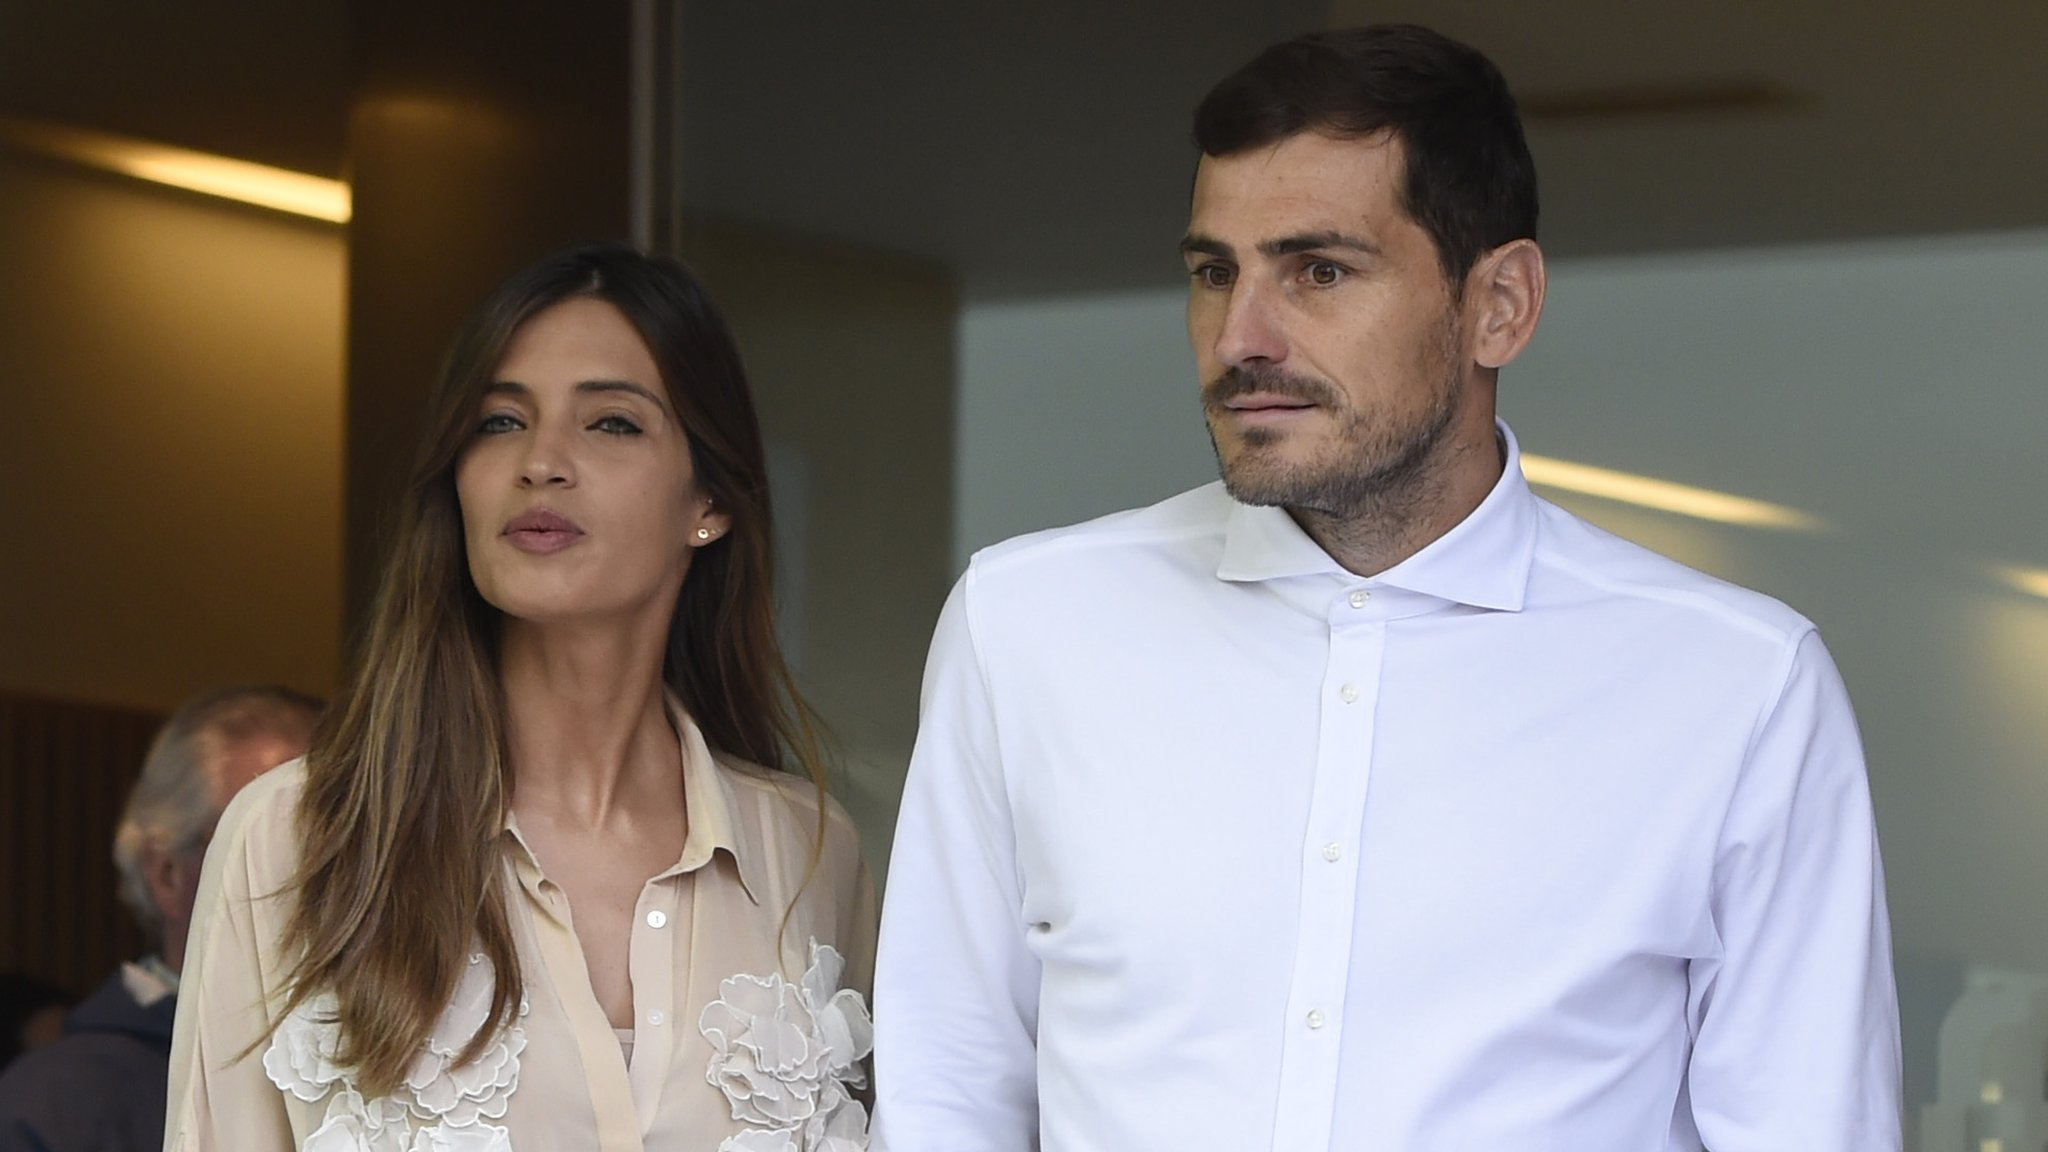 Iker Casillas: Wife battling cancer weeks after keeper's heart attack